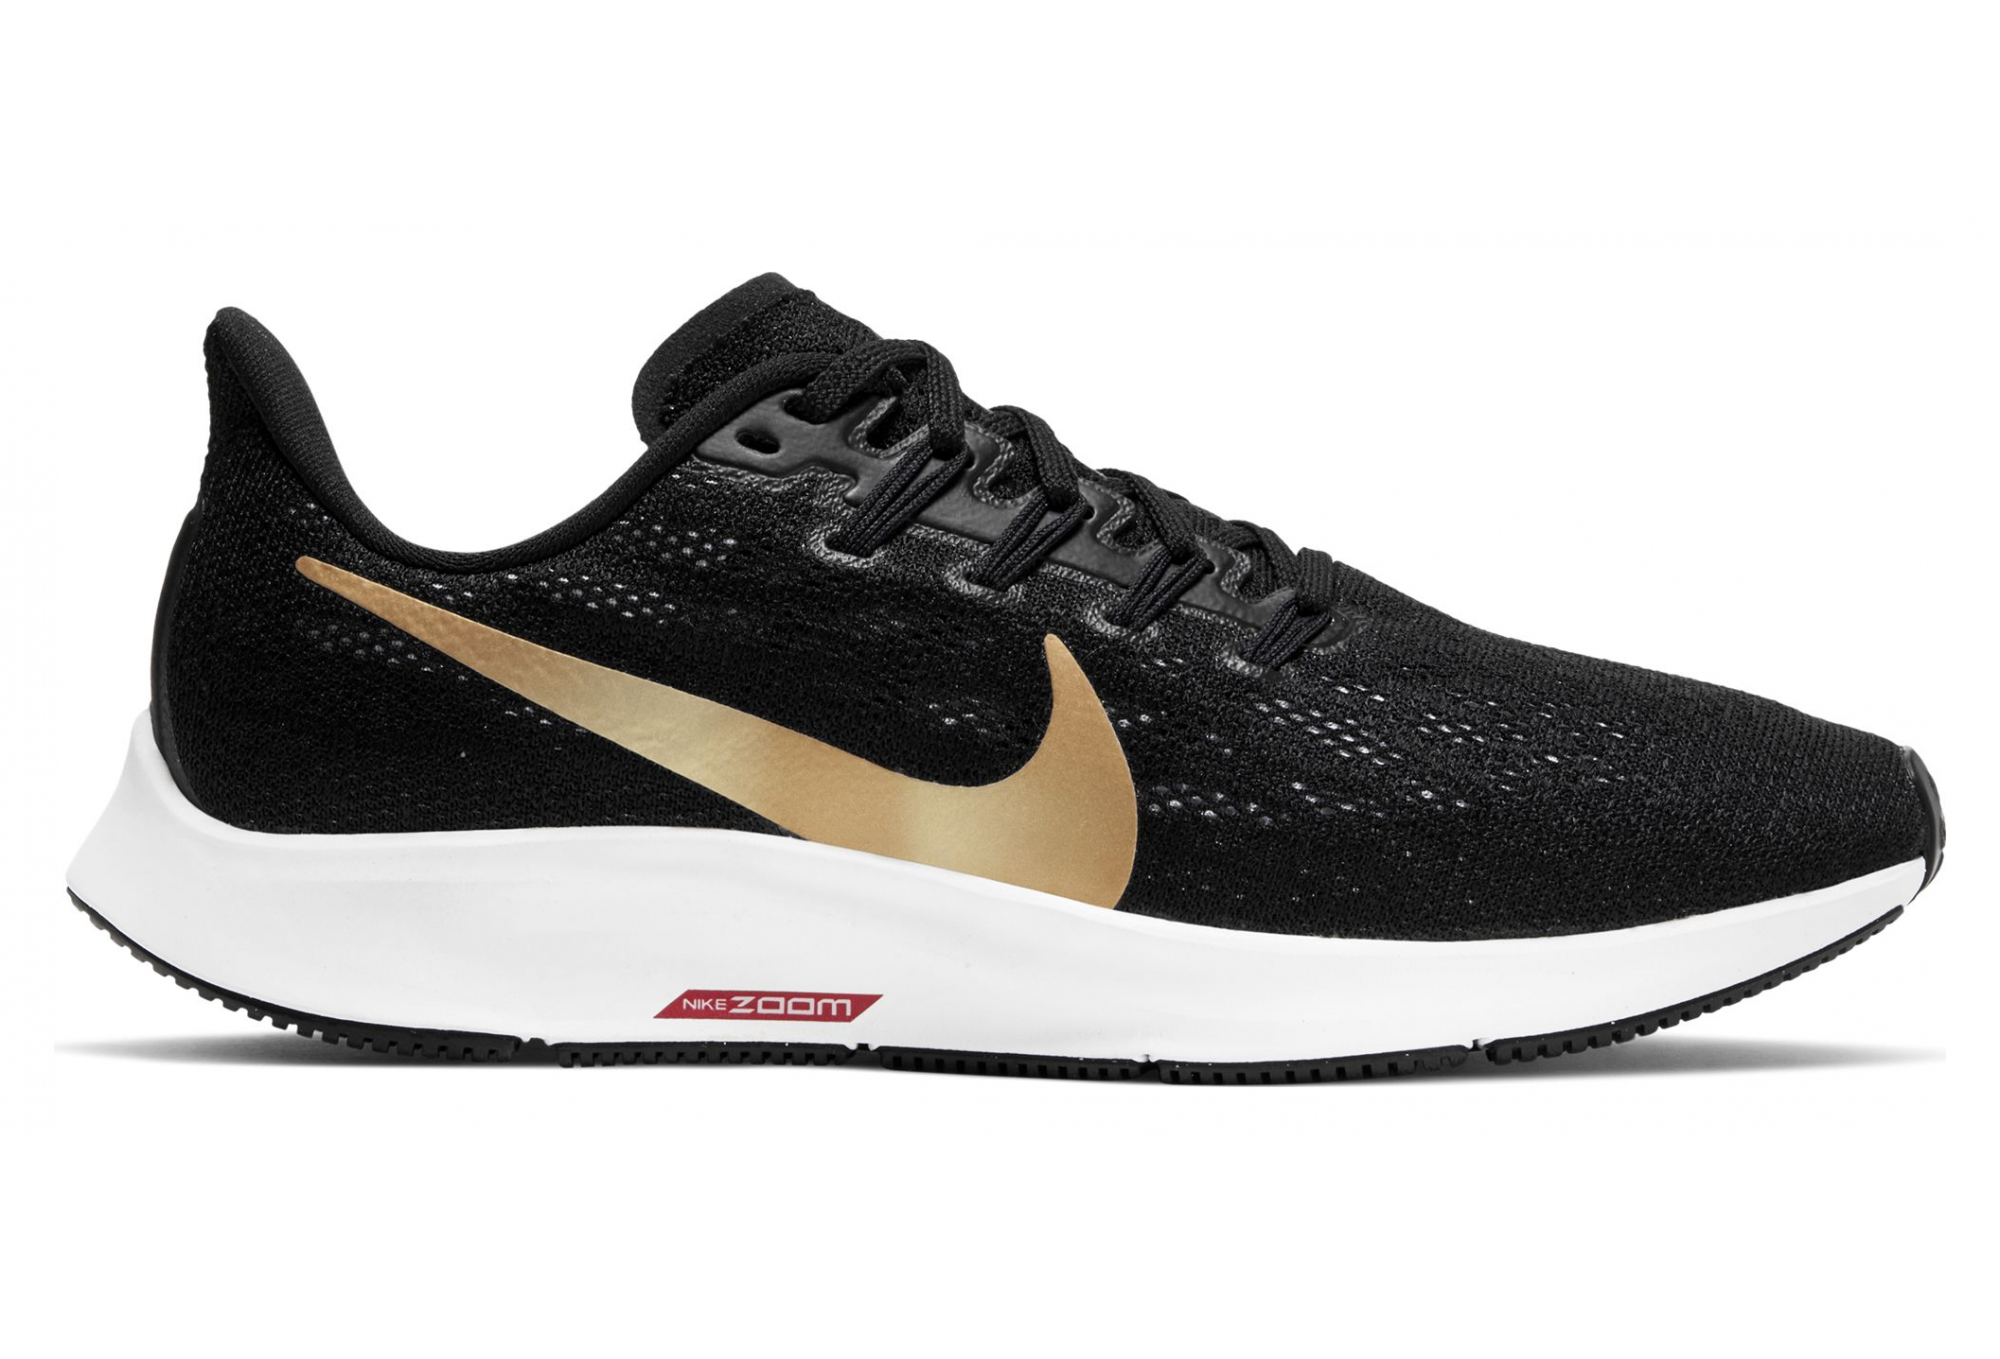 where to buy best supplier outlet online Nike Running shoes Women Air Zoom Pegasus 36 Black Or | Alltricks.com